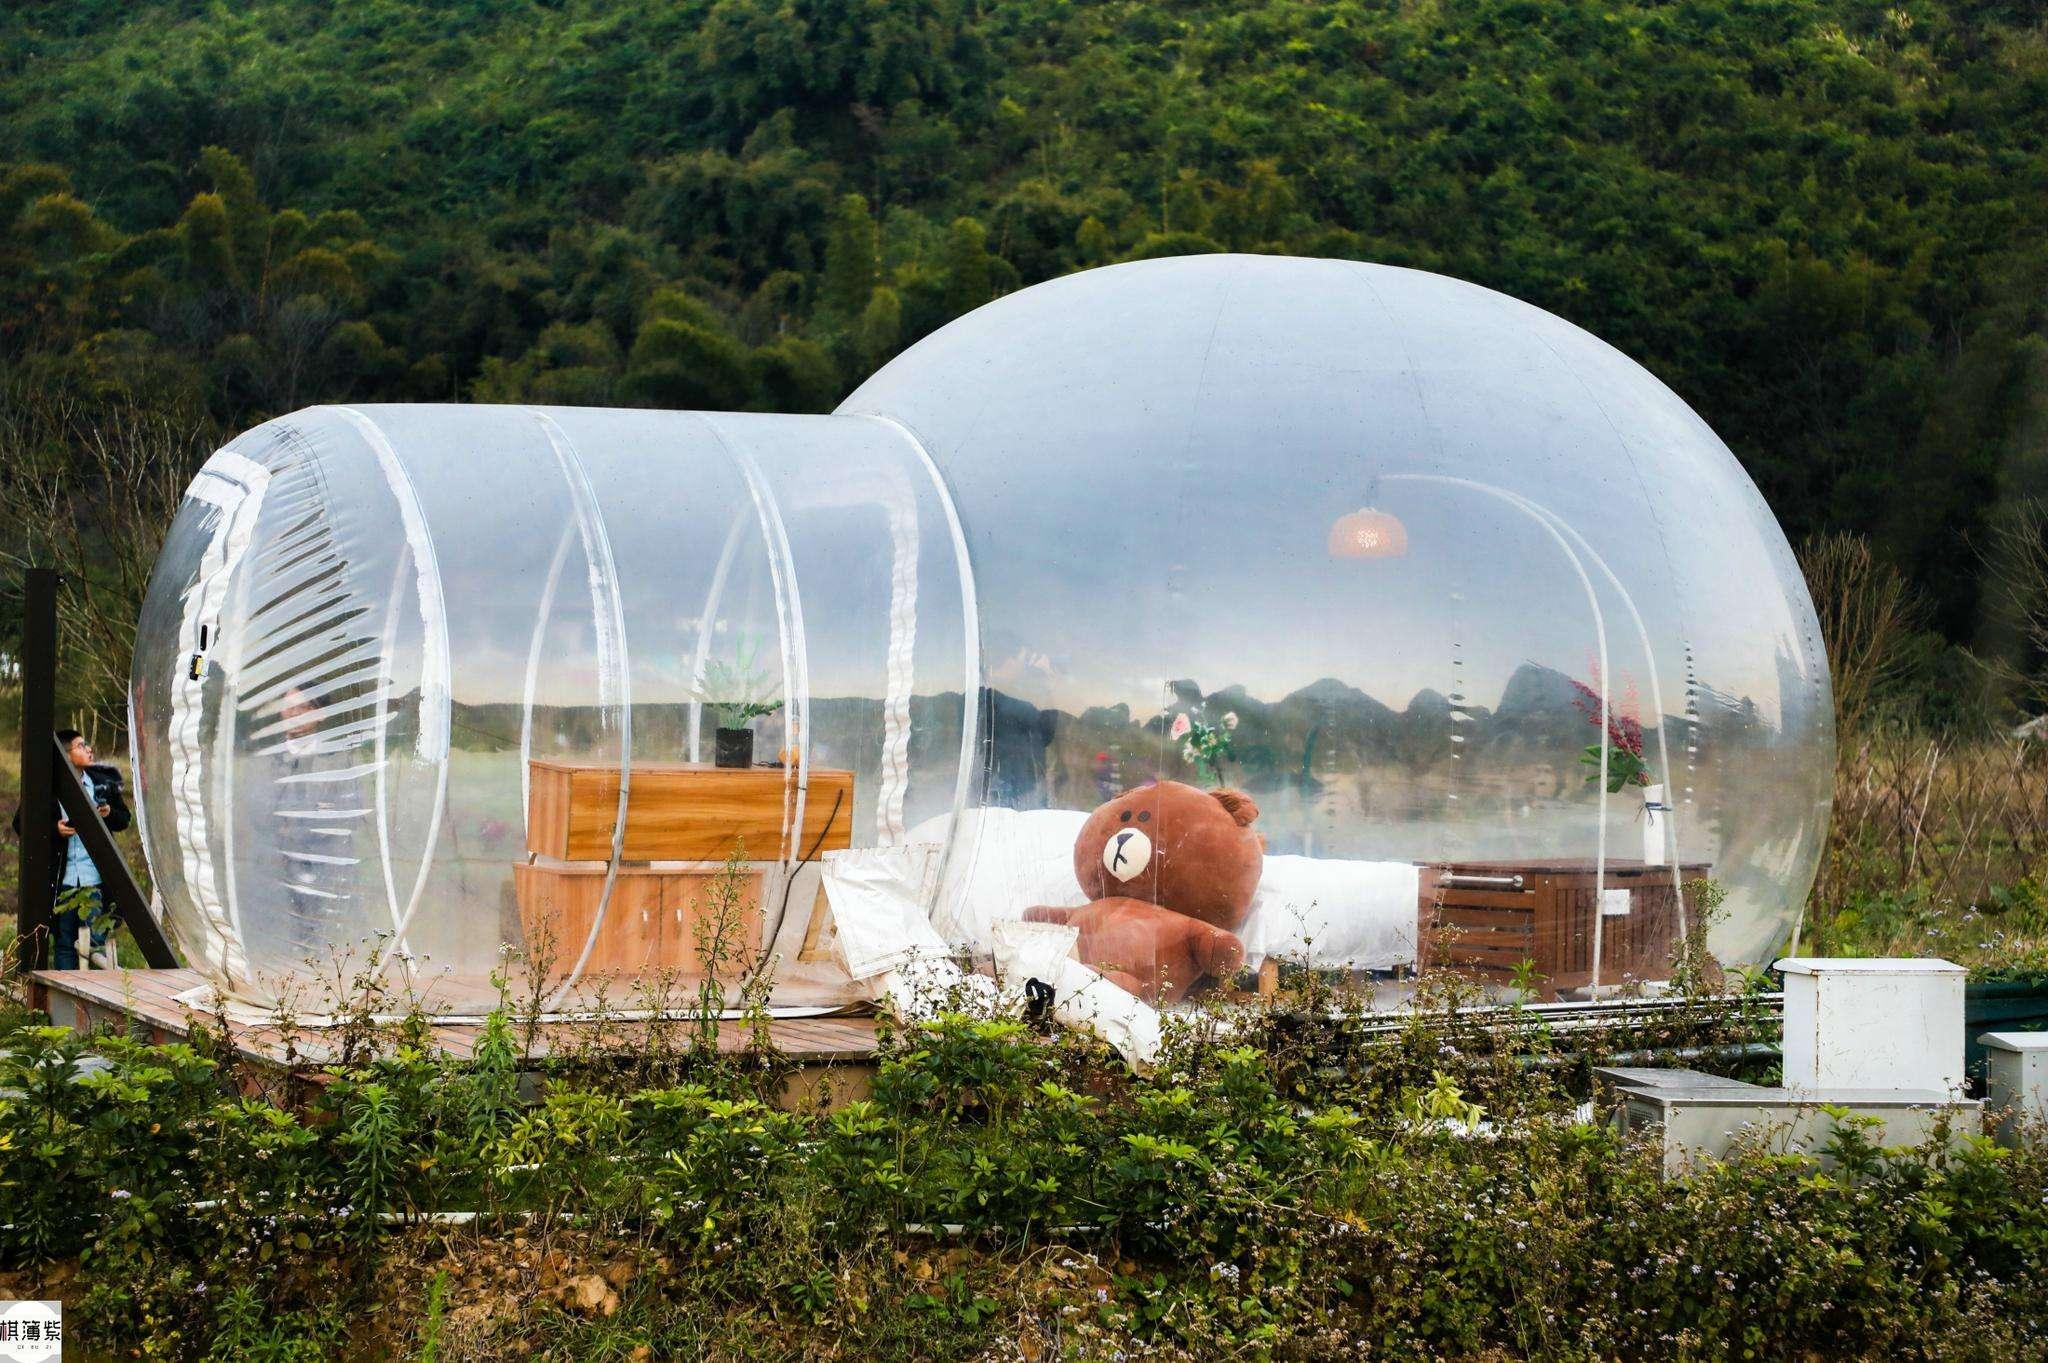 3M / 4M / 5M التخييم في الهواء الطلق نفخ فقاعة خيمة كبيرة DIY البيت الرئيسية الفناء التخييم المقصورة فقاعة الهواء لودج خيمة شفافة